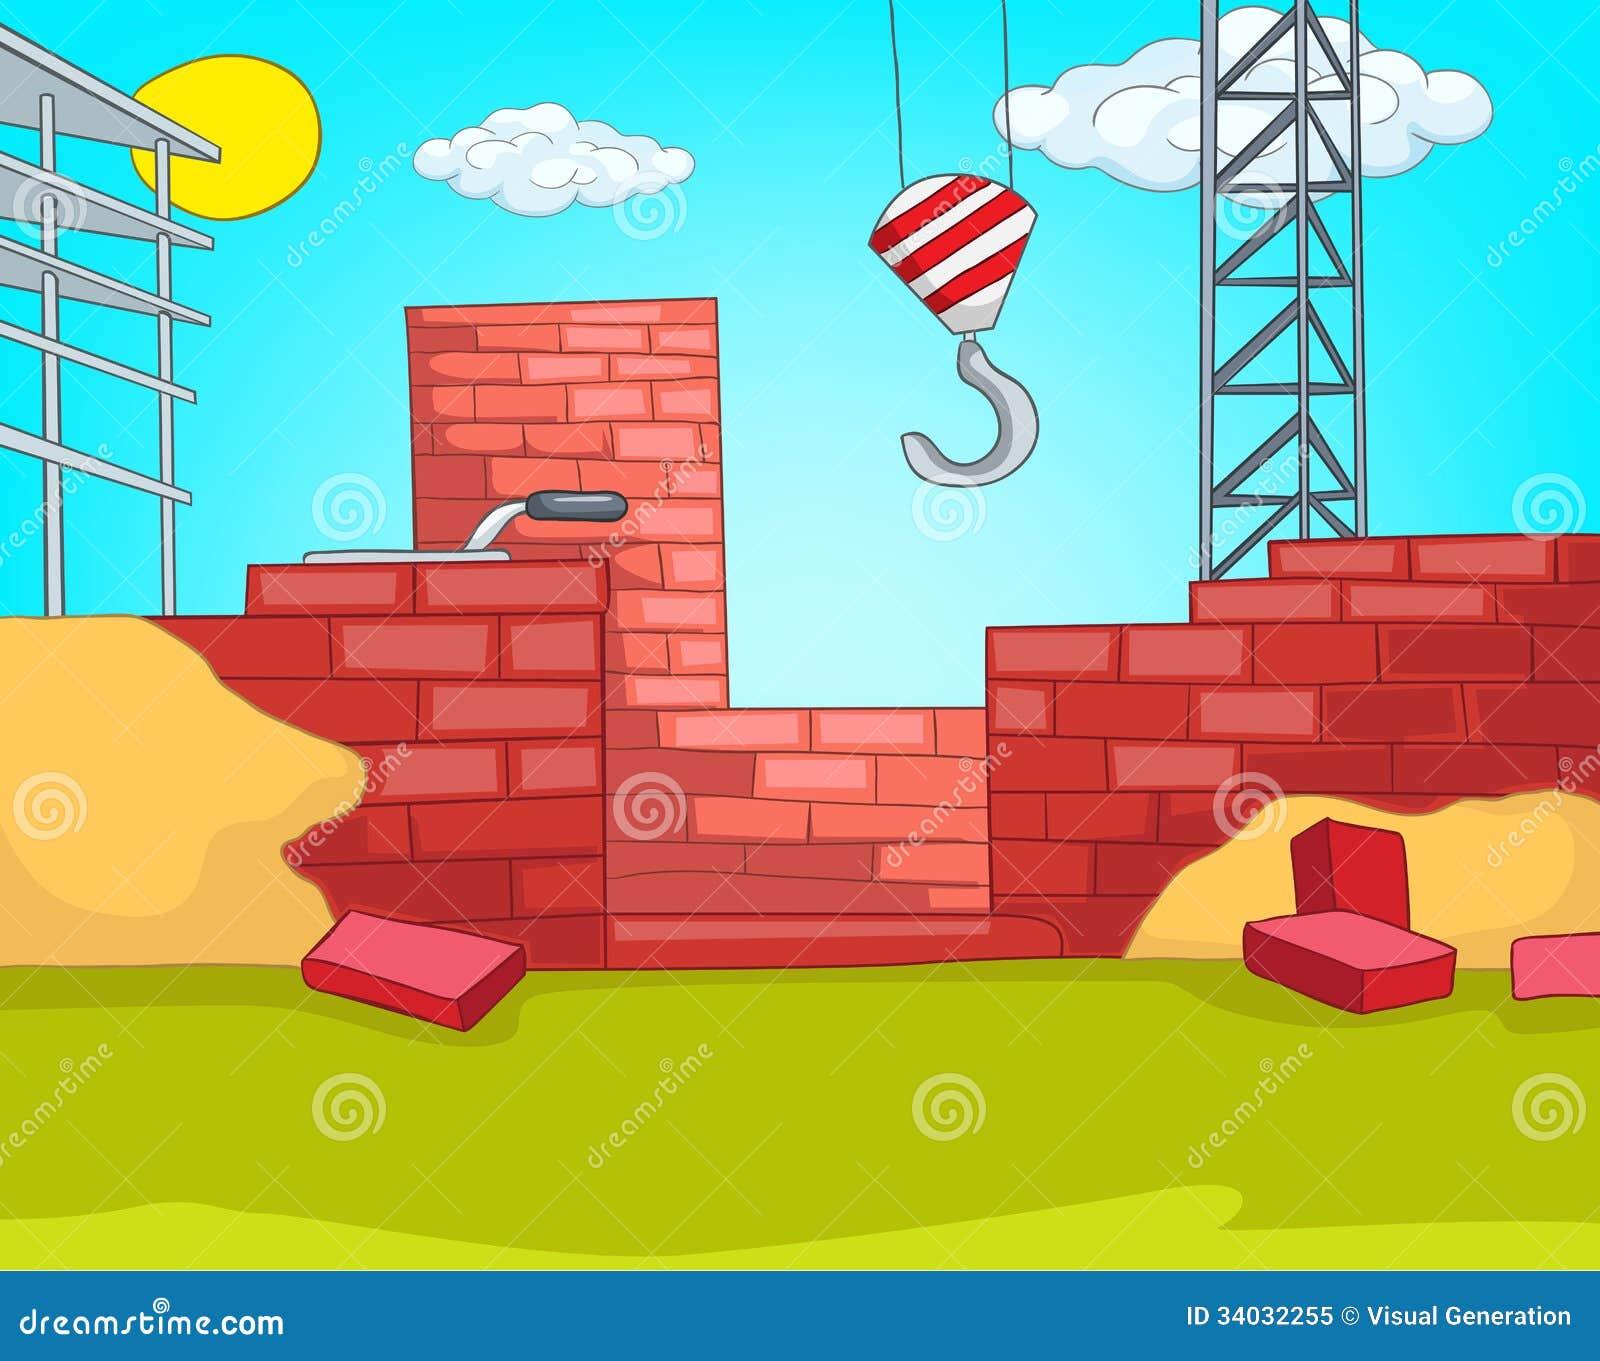 Building Construction Cartoon : Cartoon construction building pixshark images